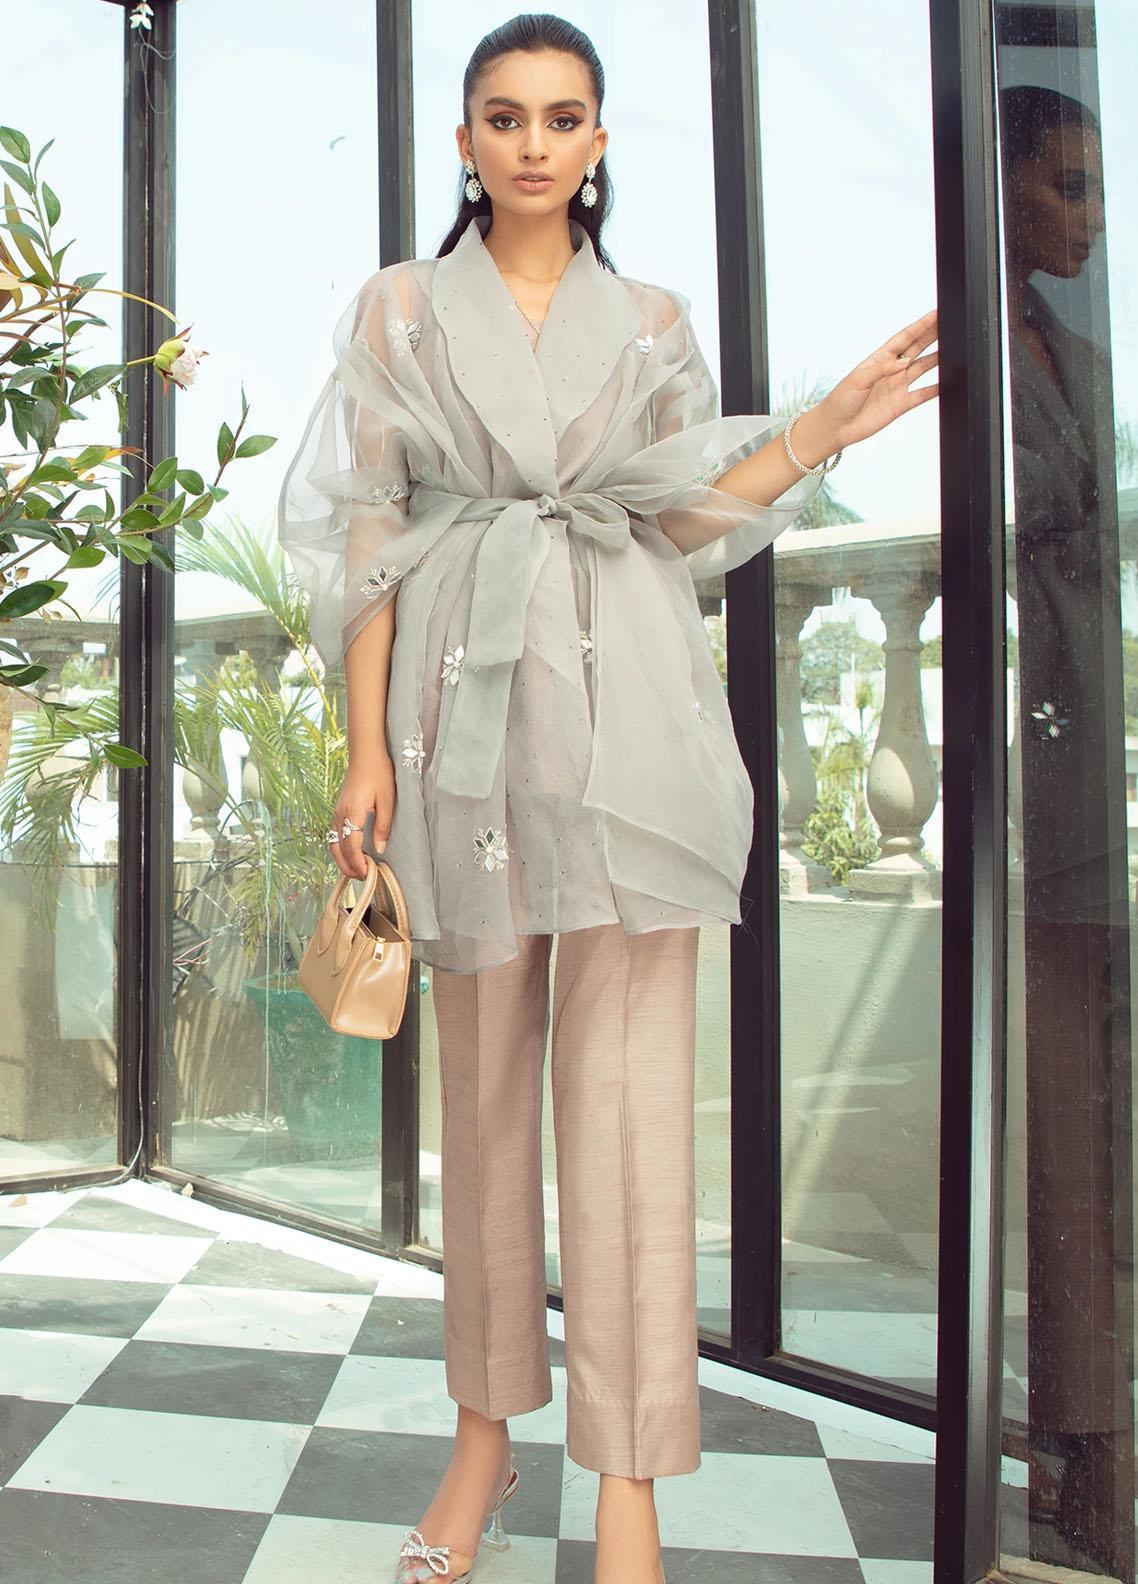 Vanya Party Wear Raw Silk Stitched 2 Piece Dress FJ-11